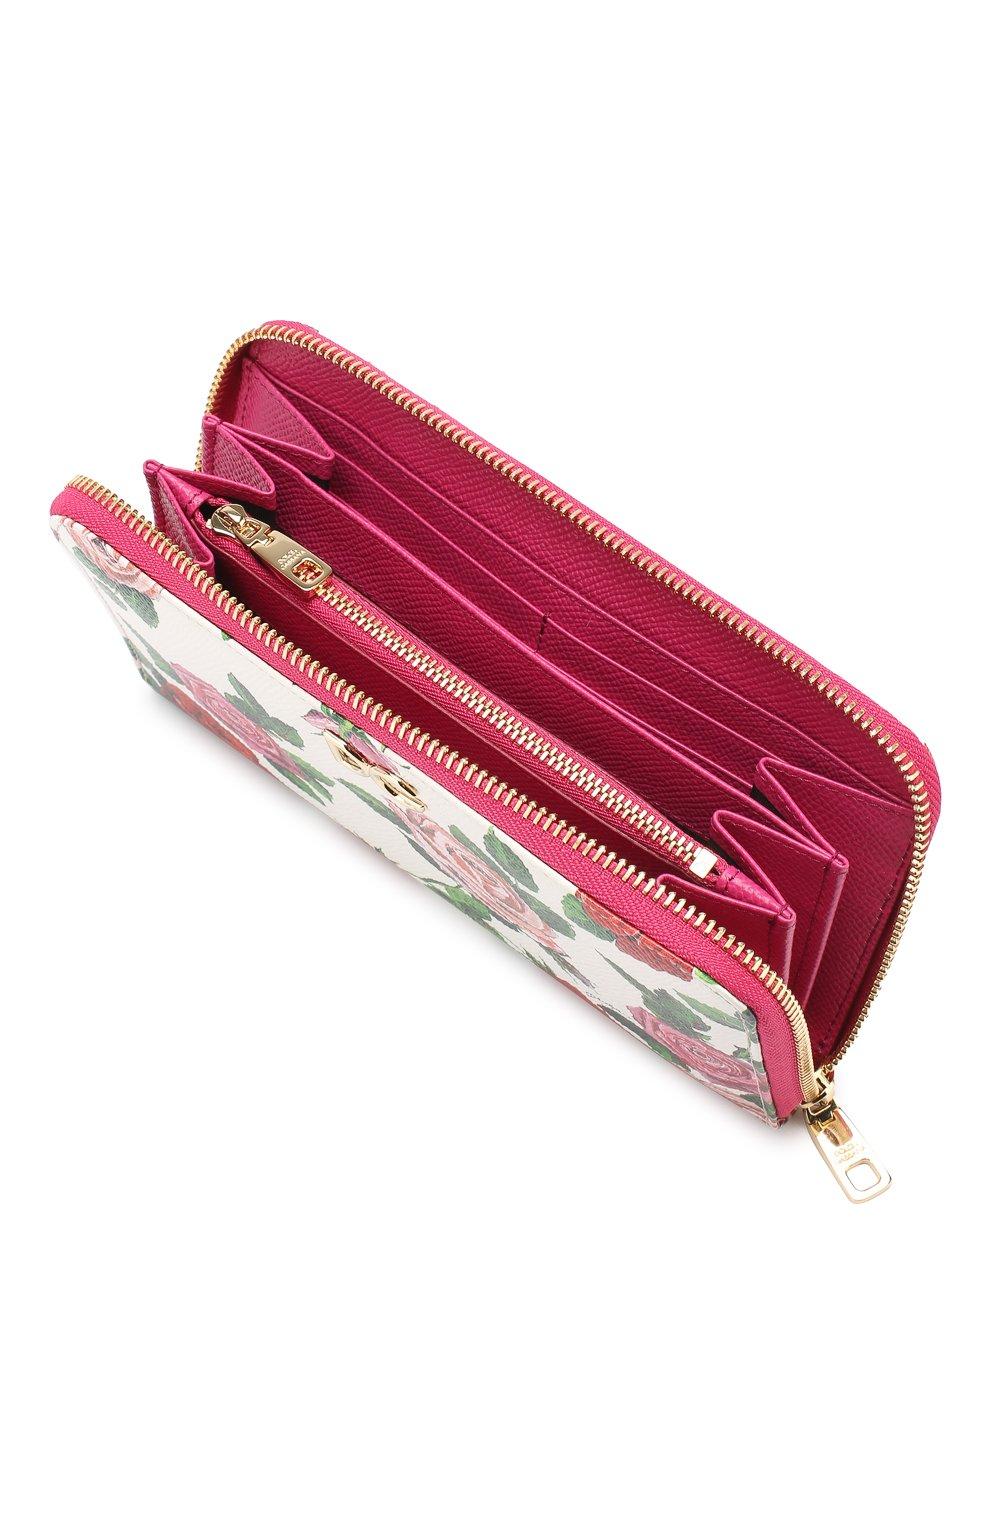 Кожаное портмоне Dolce & Gabbana разноцветного цвета | Фото №3